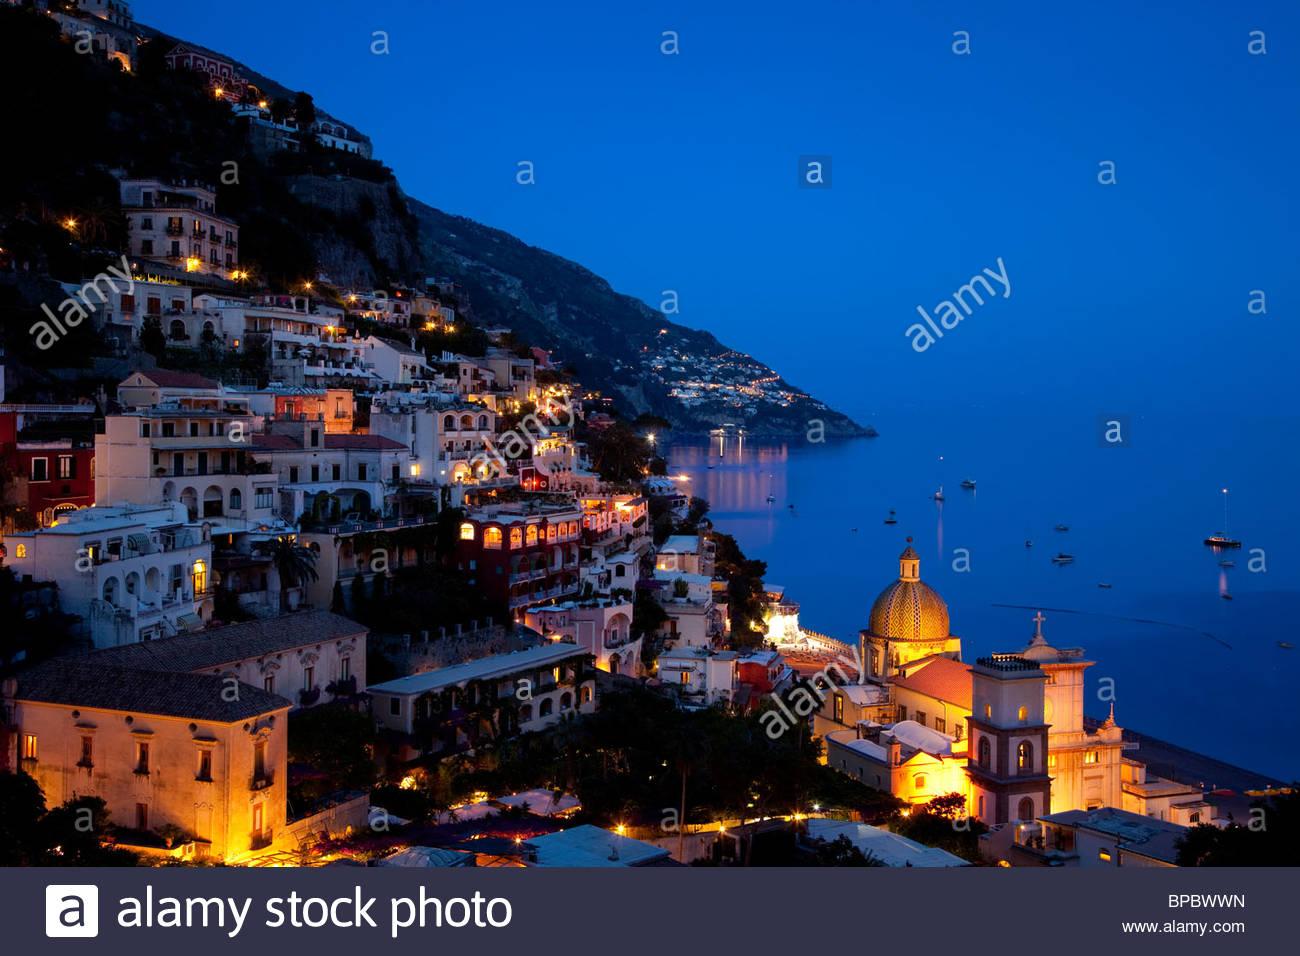 Evening view along the Amalfi coast of the hillside town of Positano, Campania Italy - Stock Image